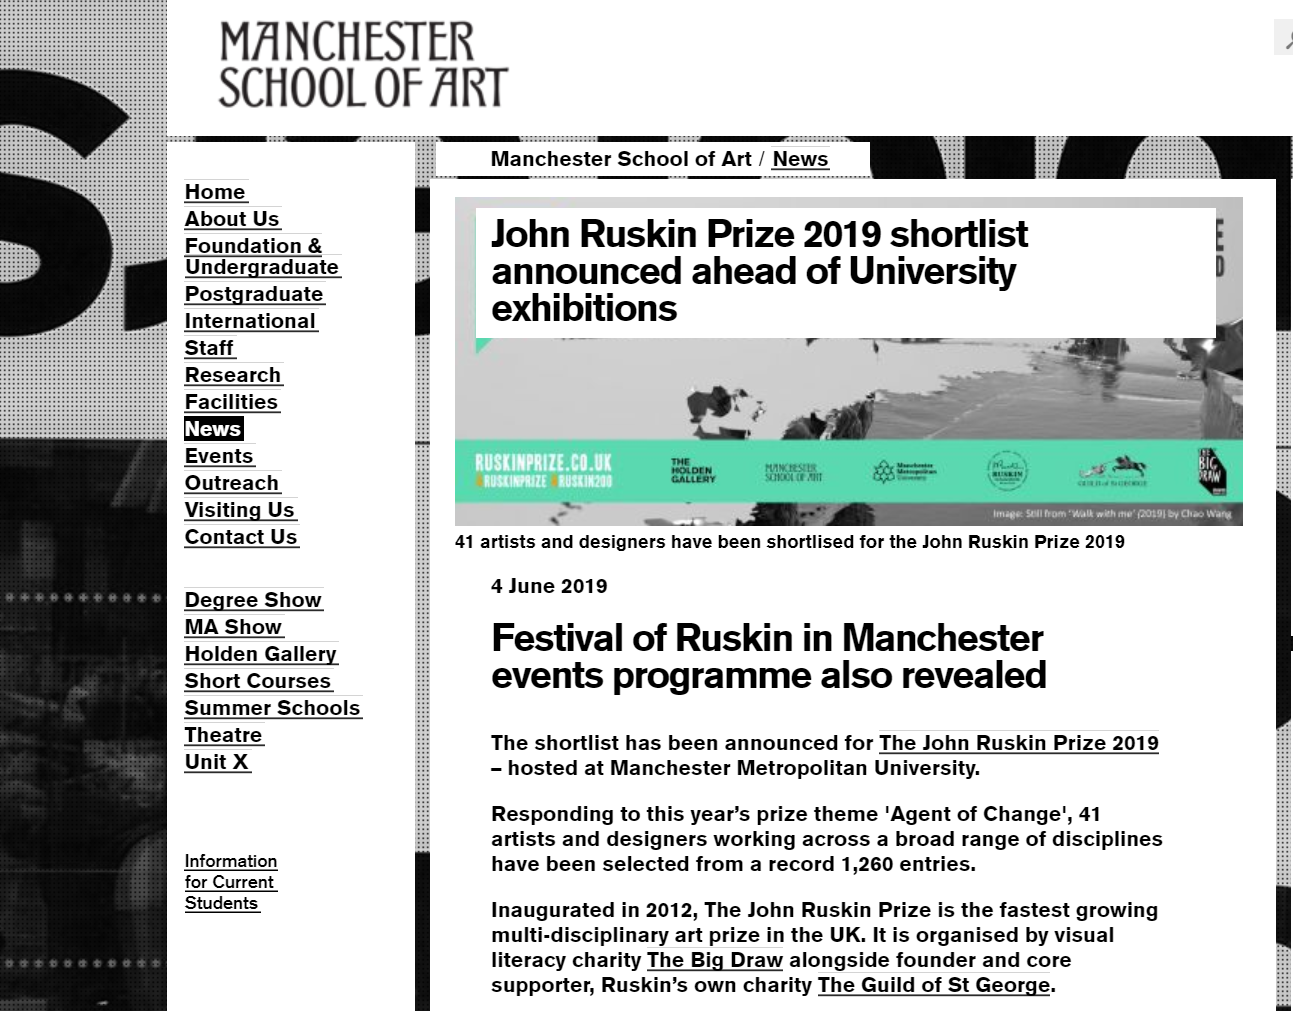 Juskin Prize MCR ART Press.png